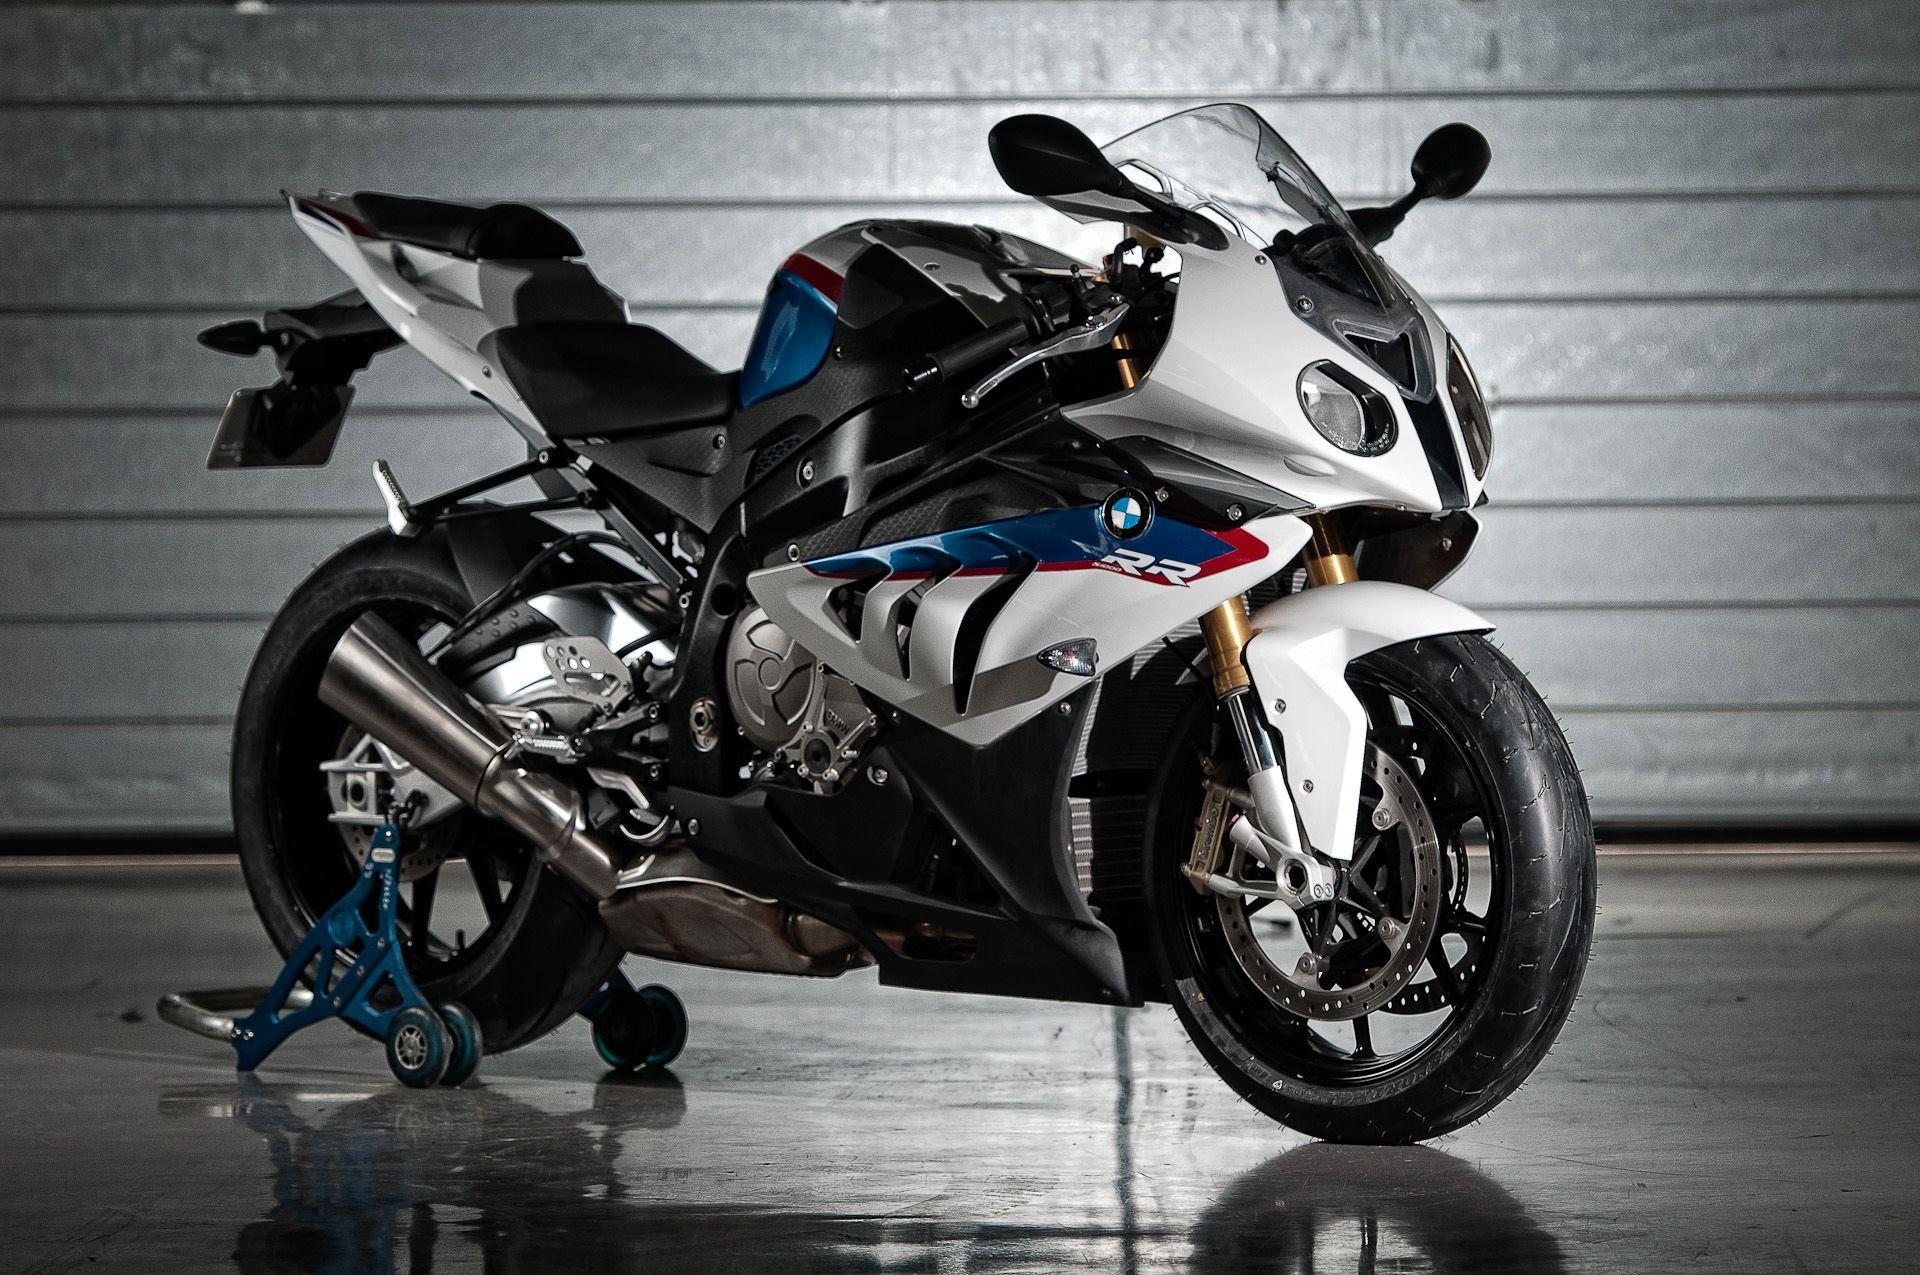 Bmw S1000rr Bike Bmw S1000rr Bmw Motorrad Motorcycle Culture